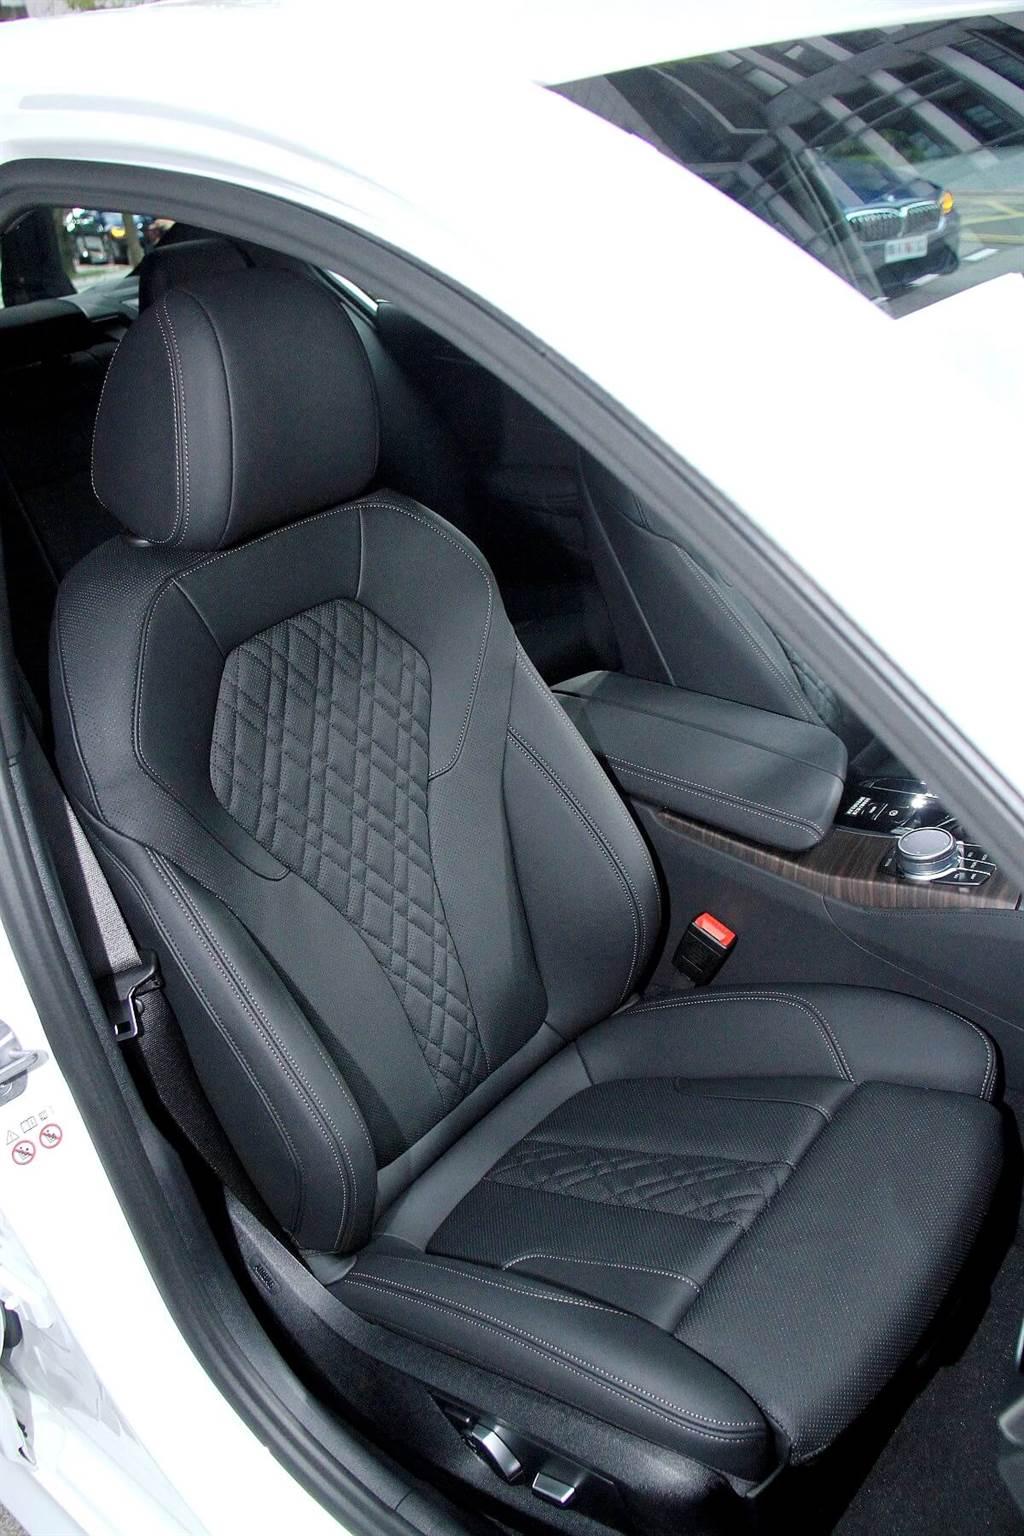 520i M Sport首發版還配置了新款Sensatec 2.0皮質包覆的跑車式座椅。新版Sensatec 2.0除了皮革質感更加柔軟以及側面包覆加厚之外,還新增了透氣口以及菱格紋縫線的設計。